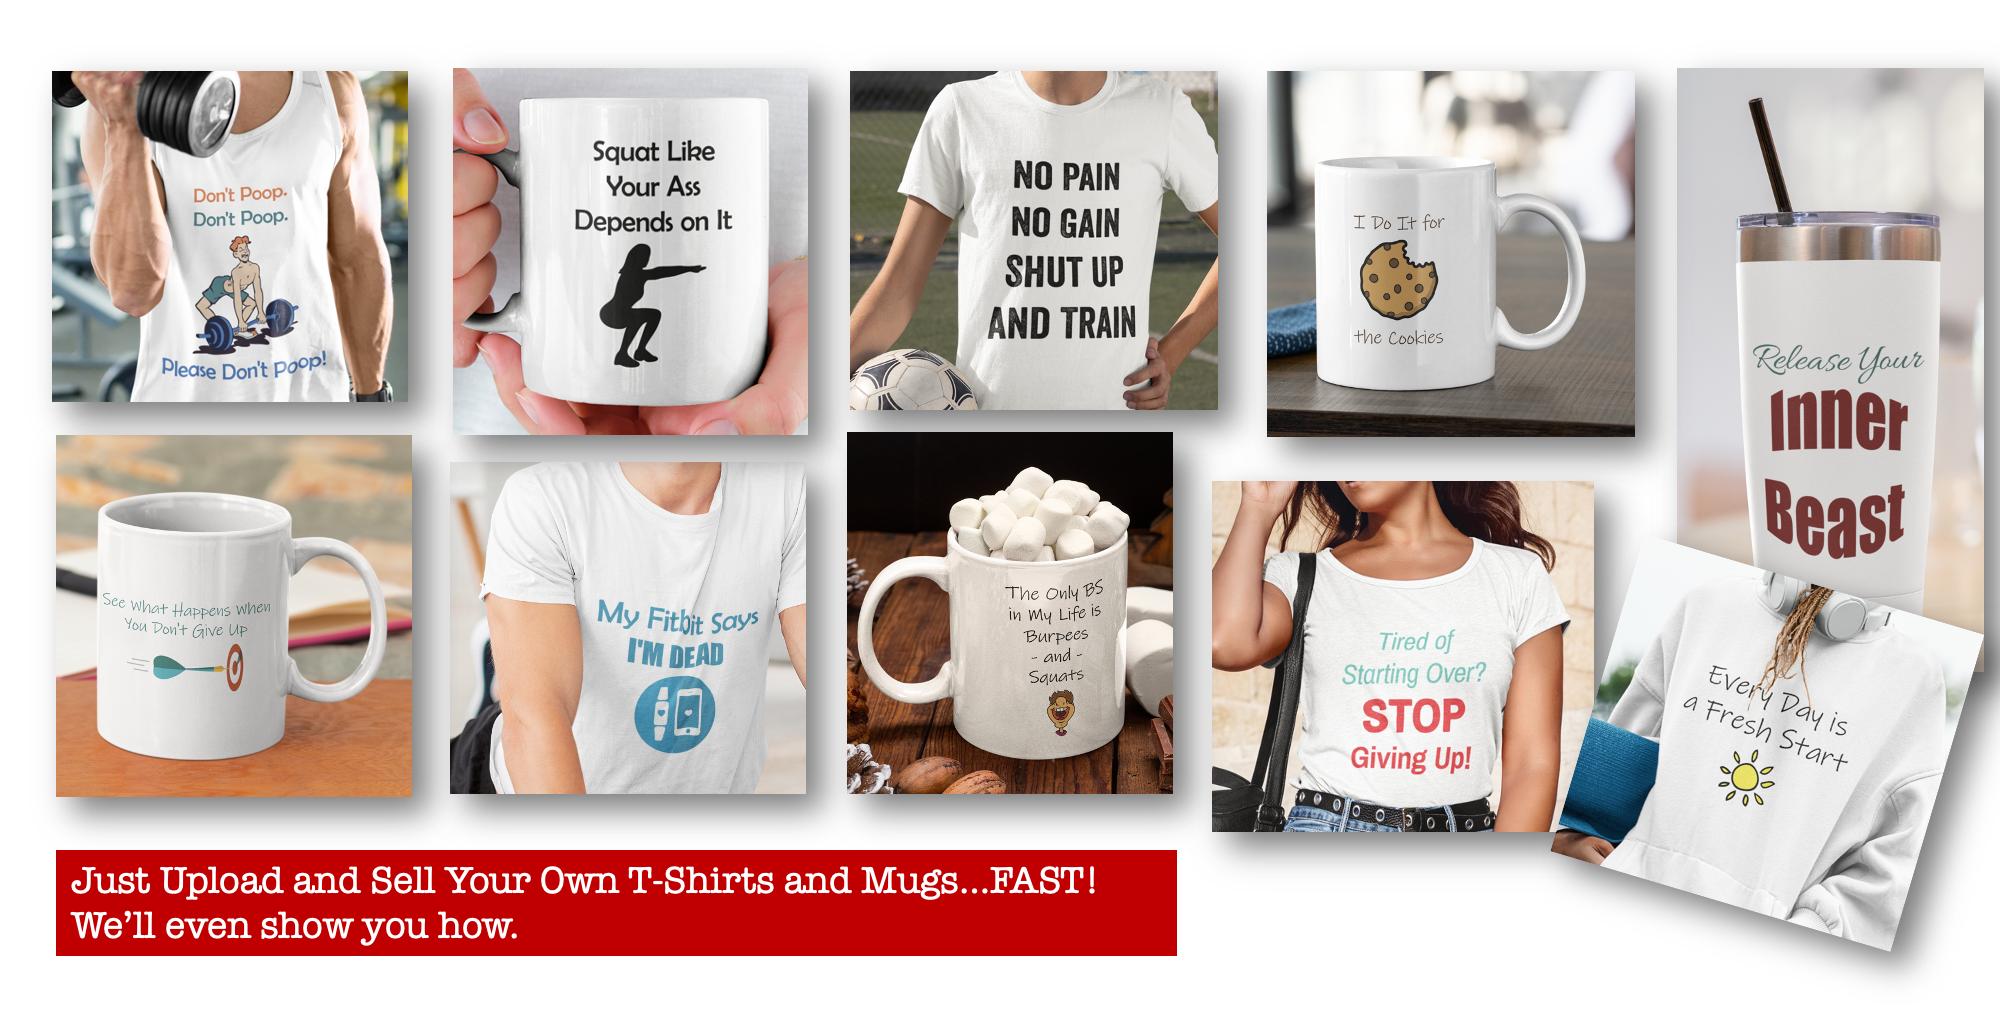 Make Instant Tshirts and Mugs